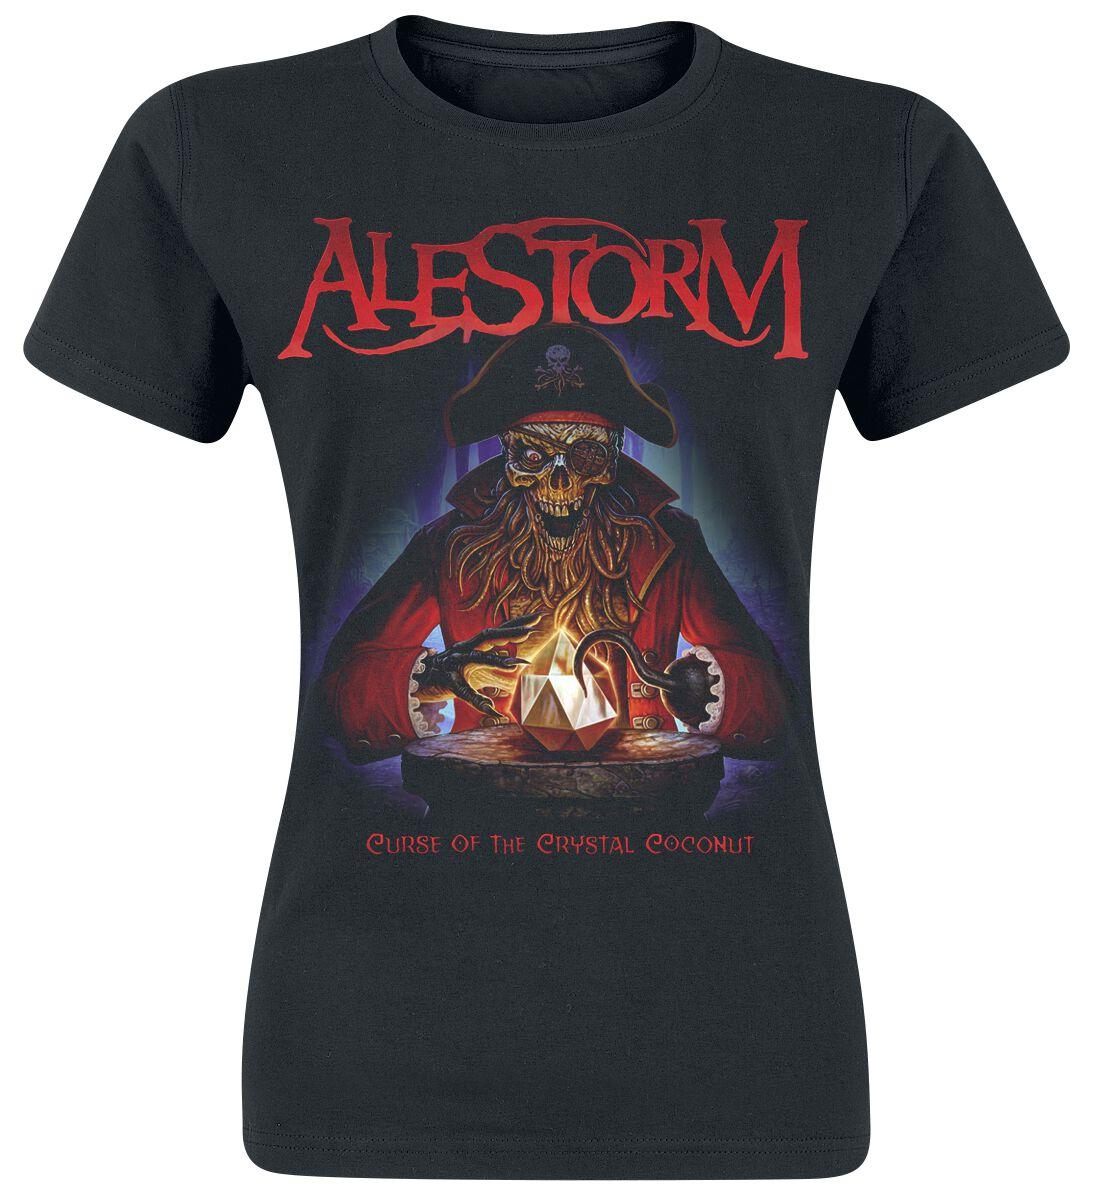 Image of Alestorm Curse Of The Crystal Coconut Girl-Shirt schwarz